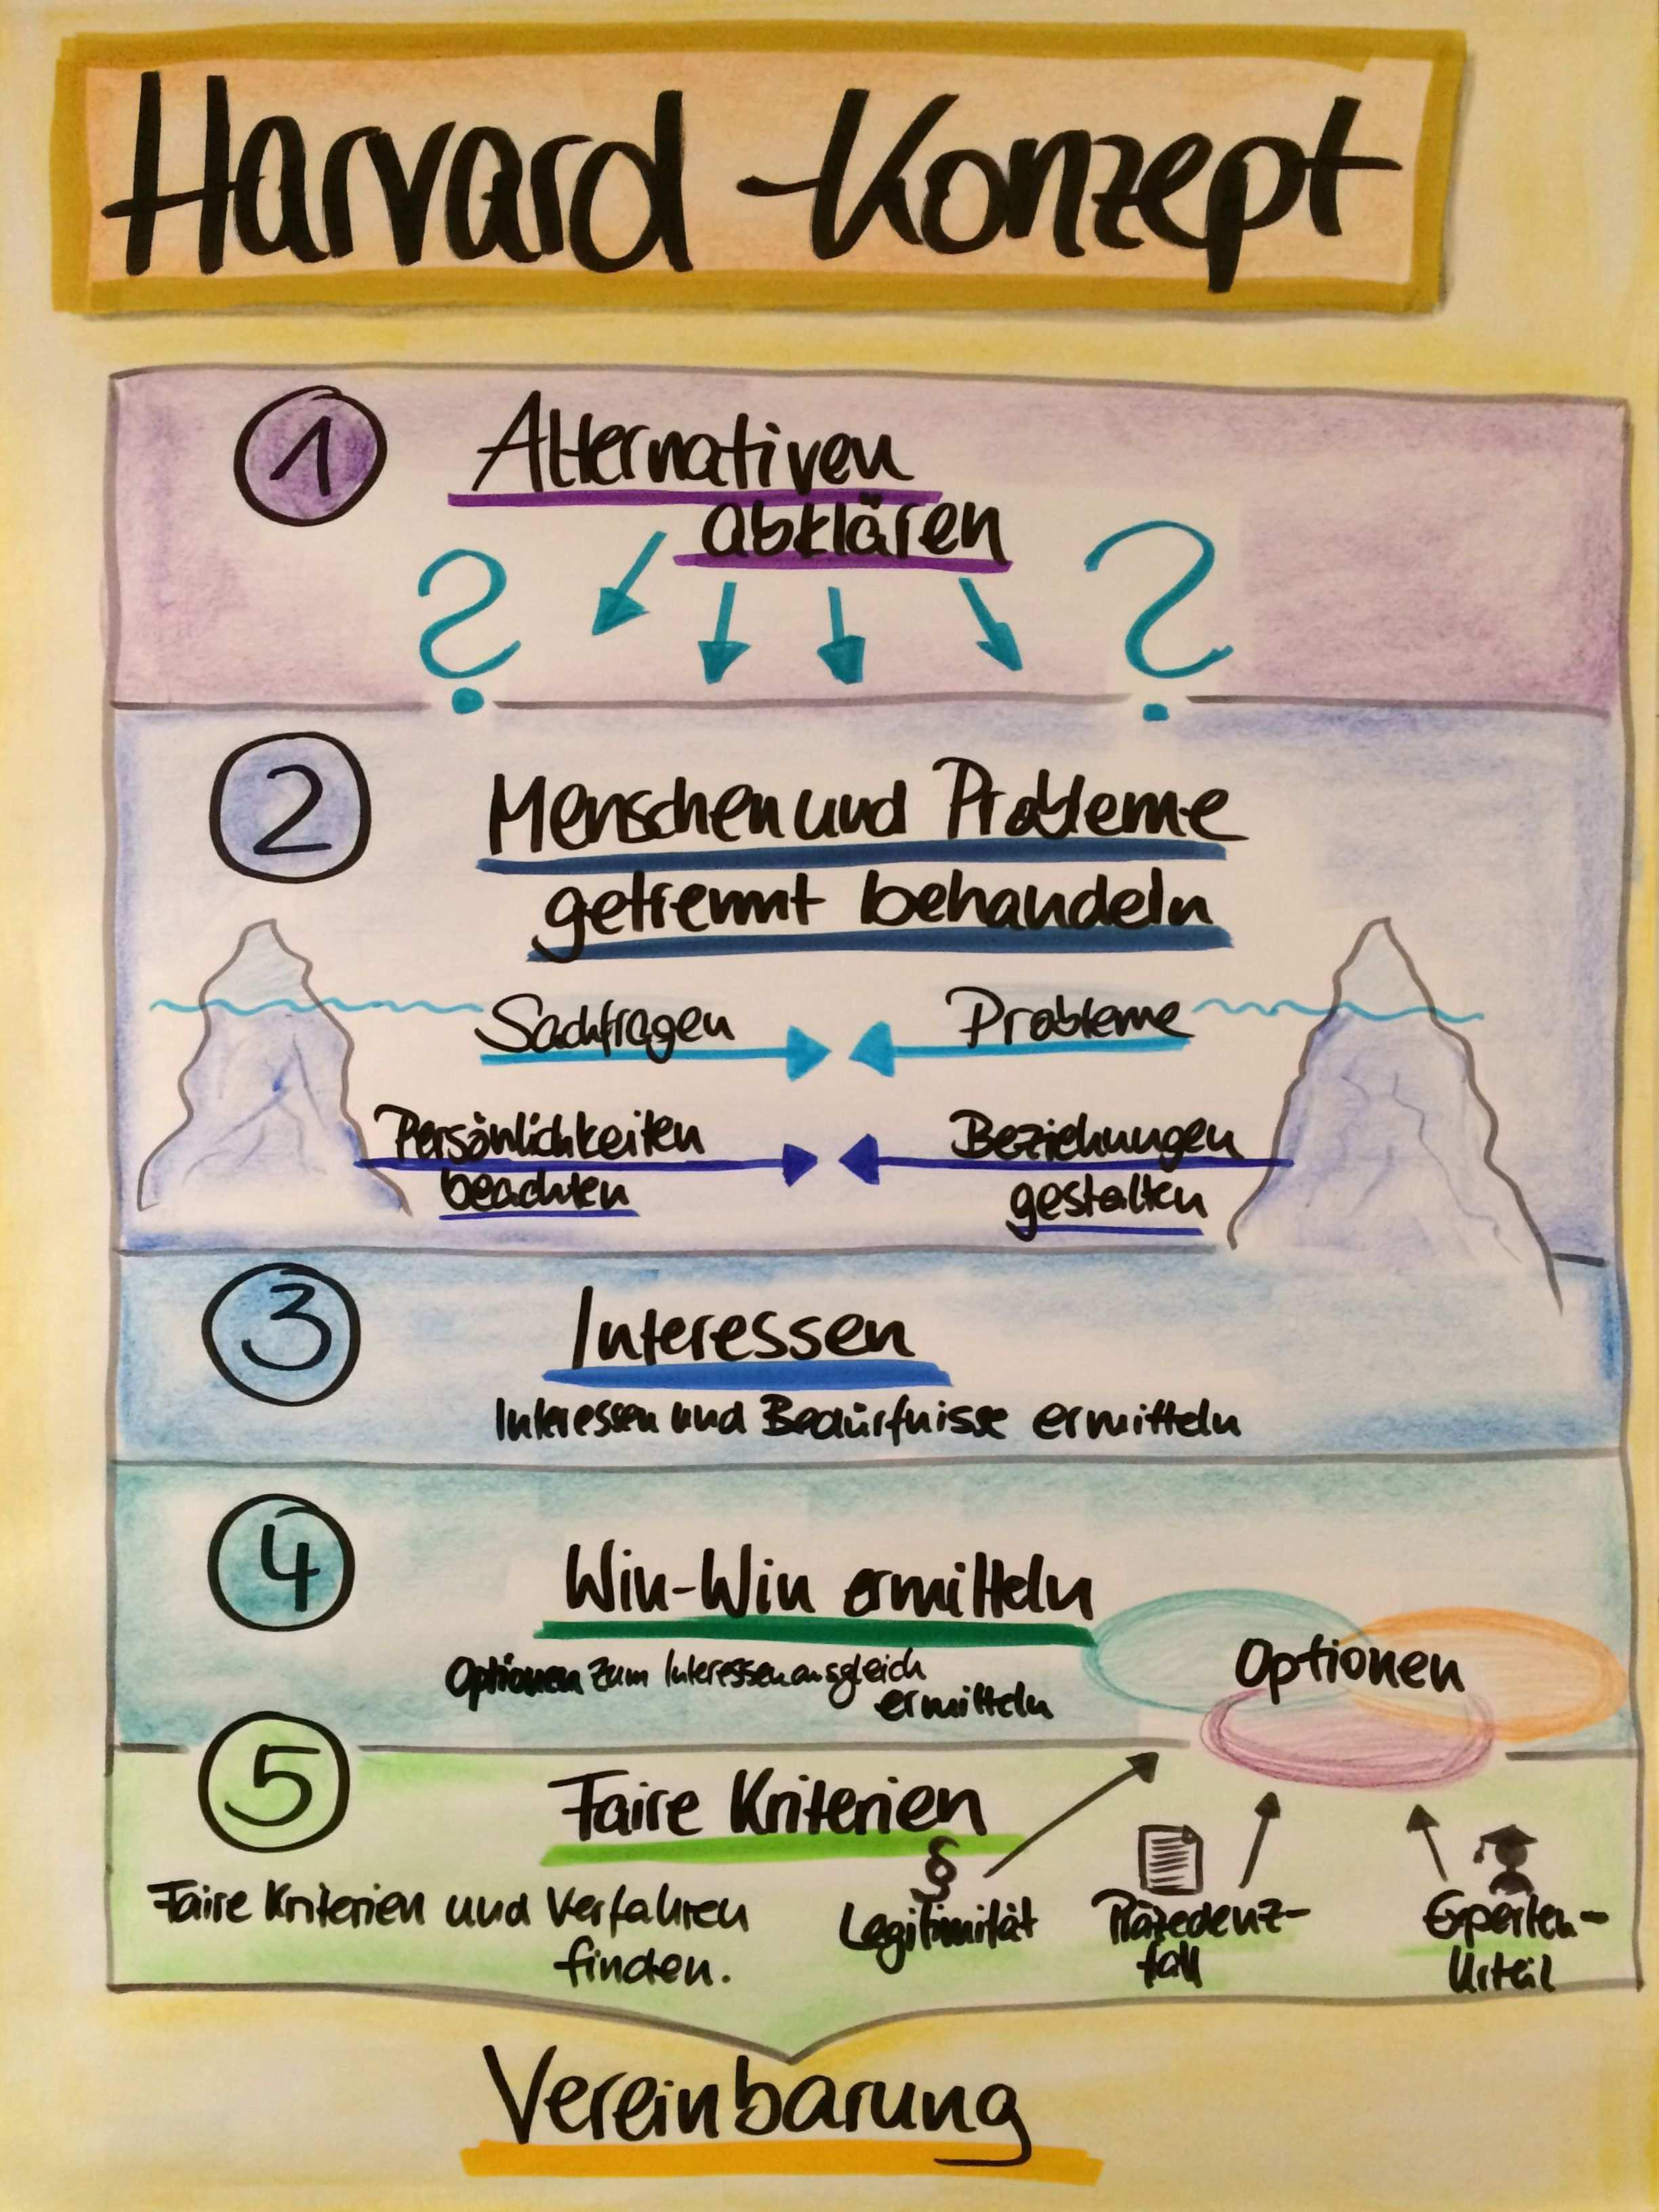 Harvard Konzept Harvard Concept Kommunikation Konflikt Training Flipchart Kommunikation Lernen Kommunikation Menschenfuhrung